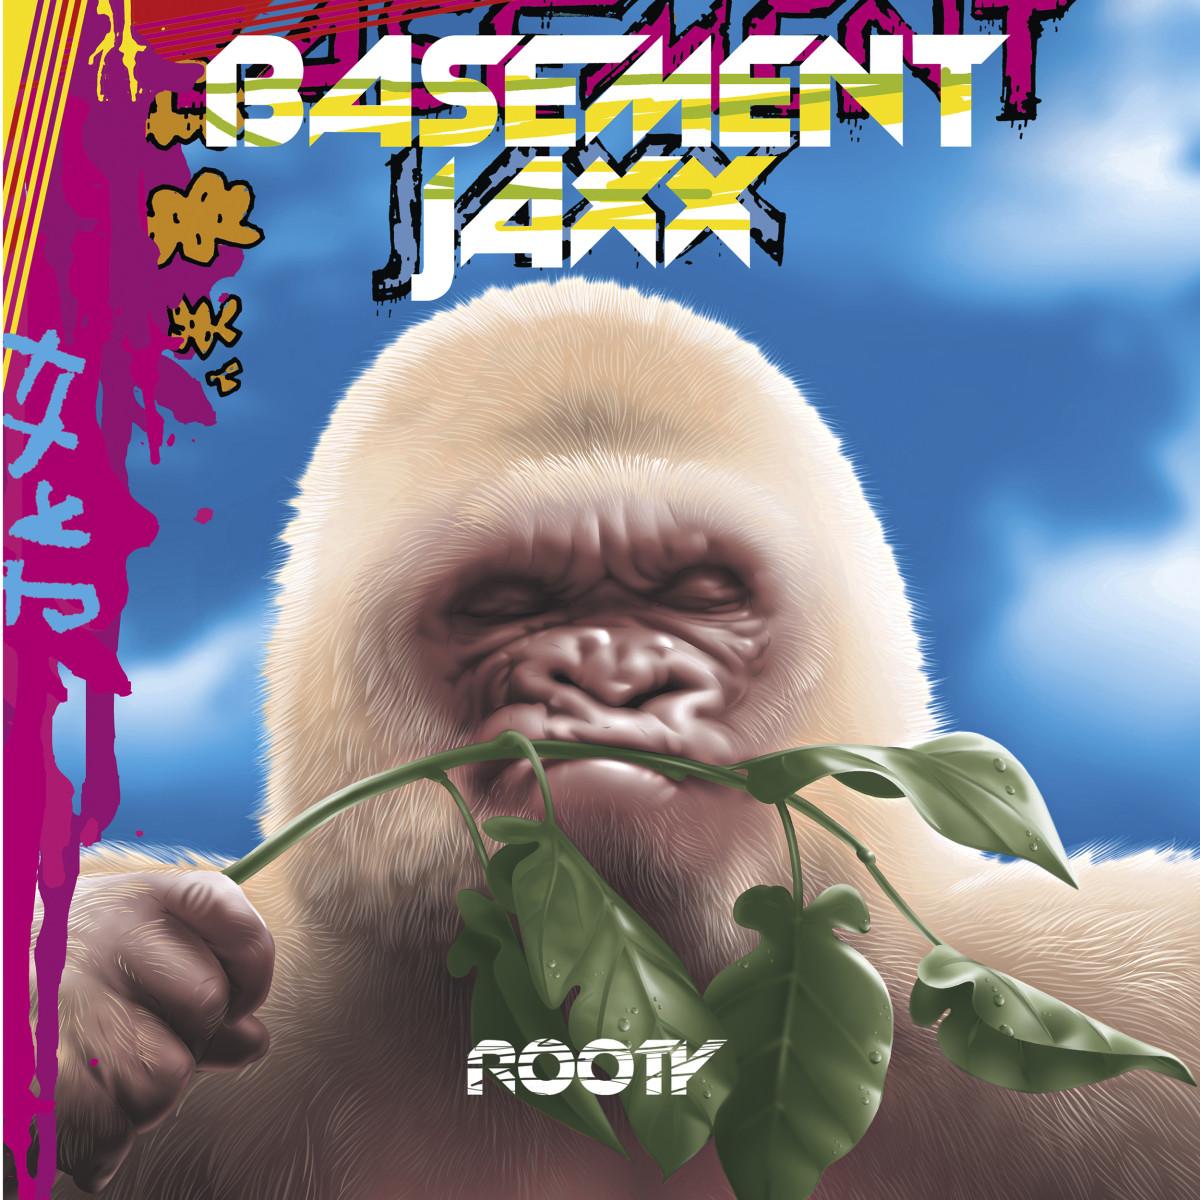 "Basement Jaxx / Basement Jaxx / Basement Jaxx<span class=""slide_numbers""><span class=""slide_number"">1</span>/2</span>"